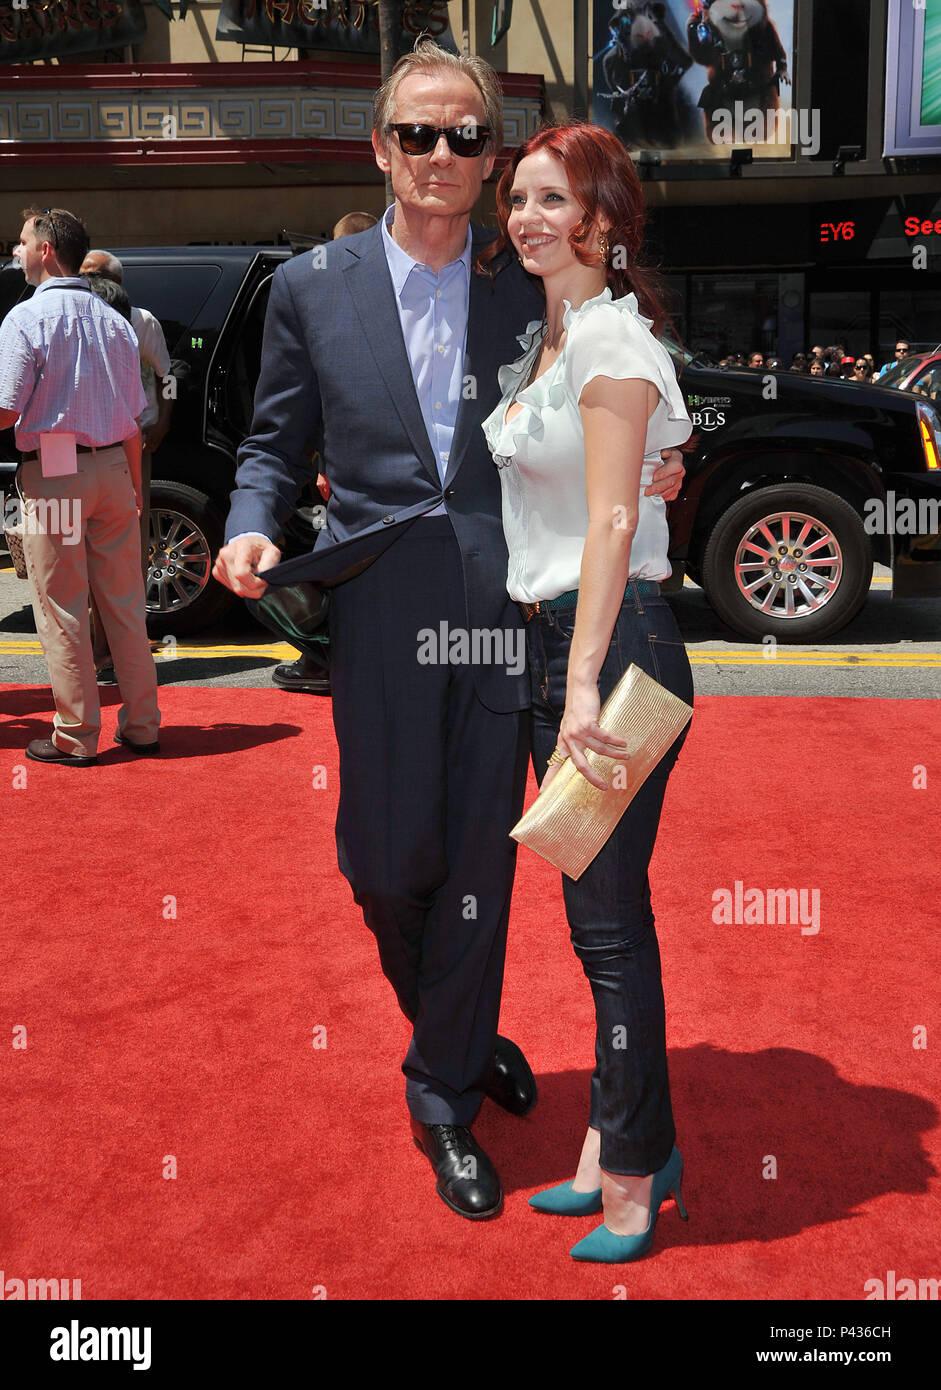 Bill Nighy And Kelli Garner G Force Premiere At The El Capitan Theatre In Los Angeles